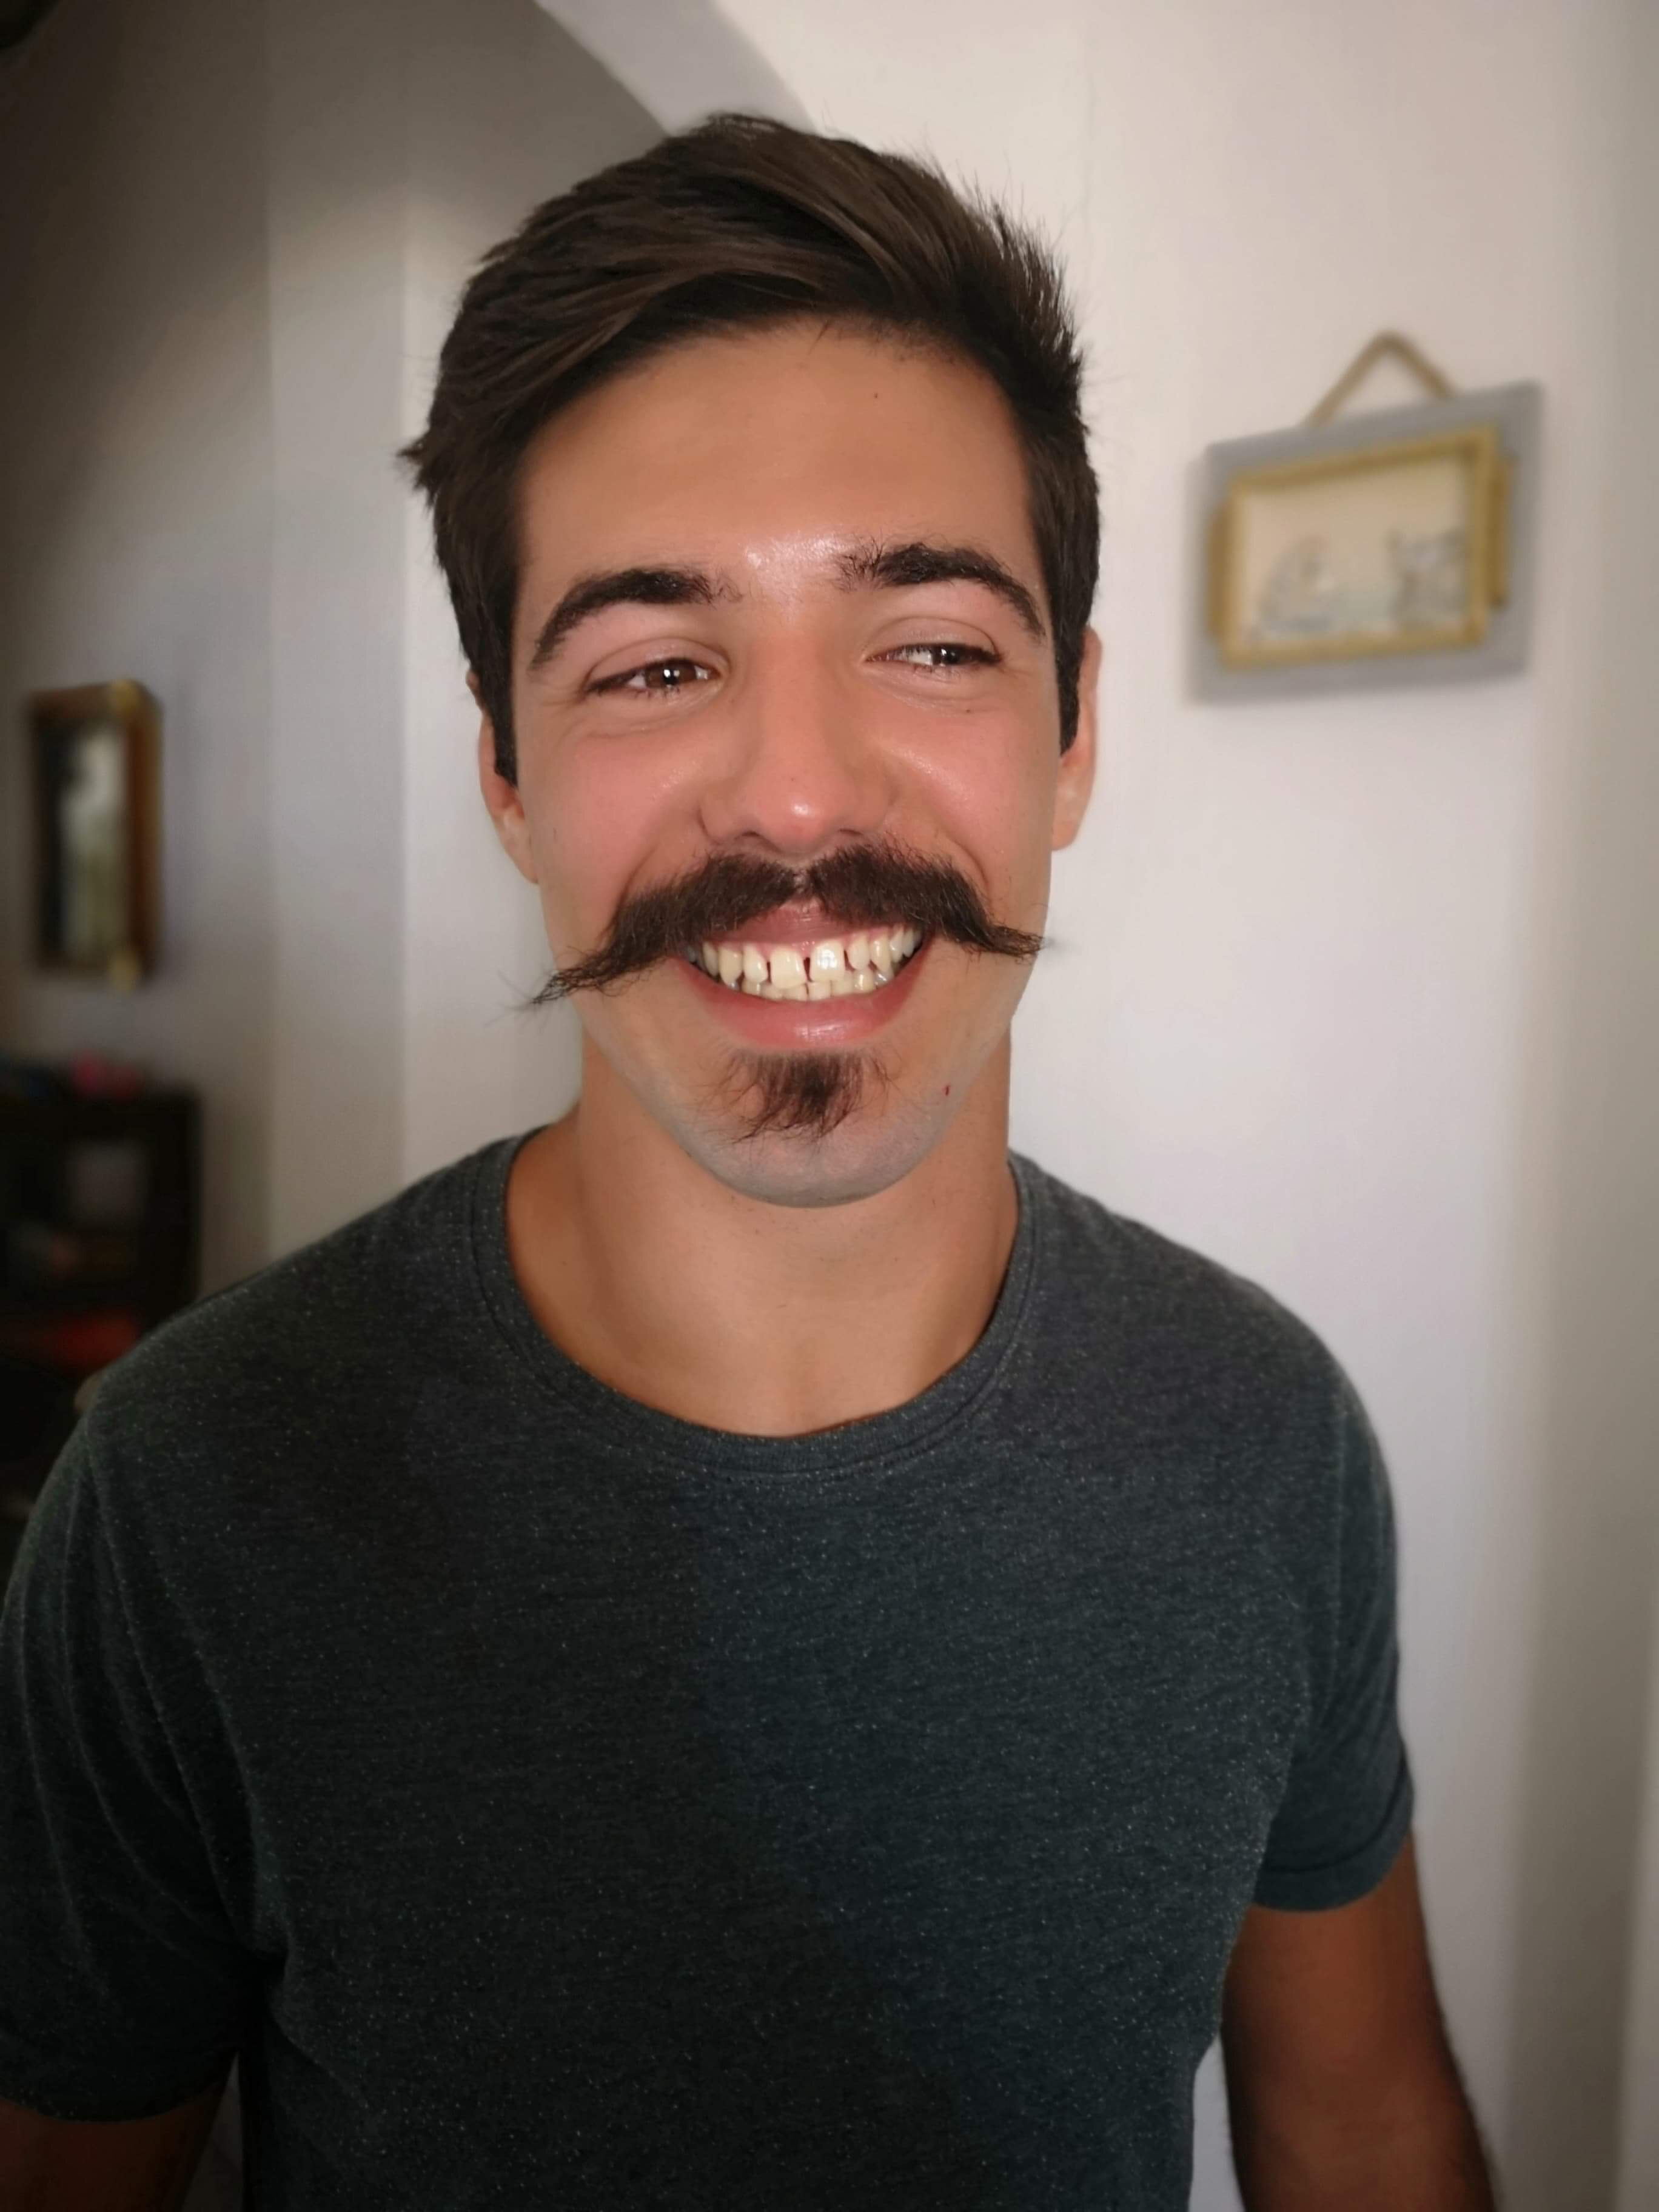 Guilherme Viegas